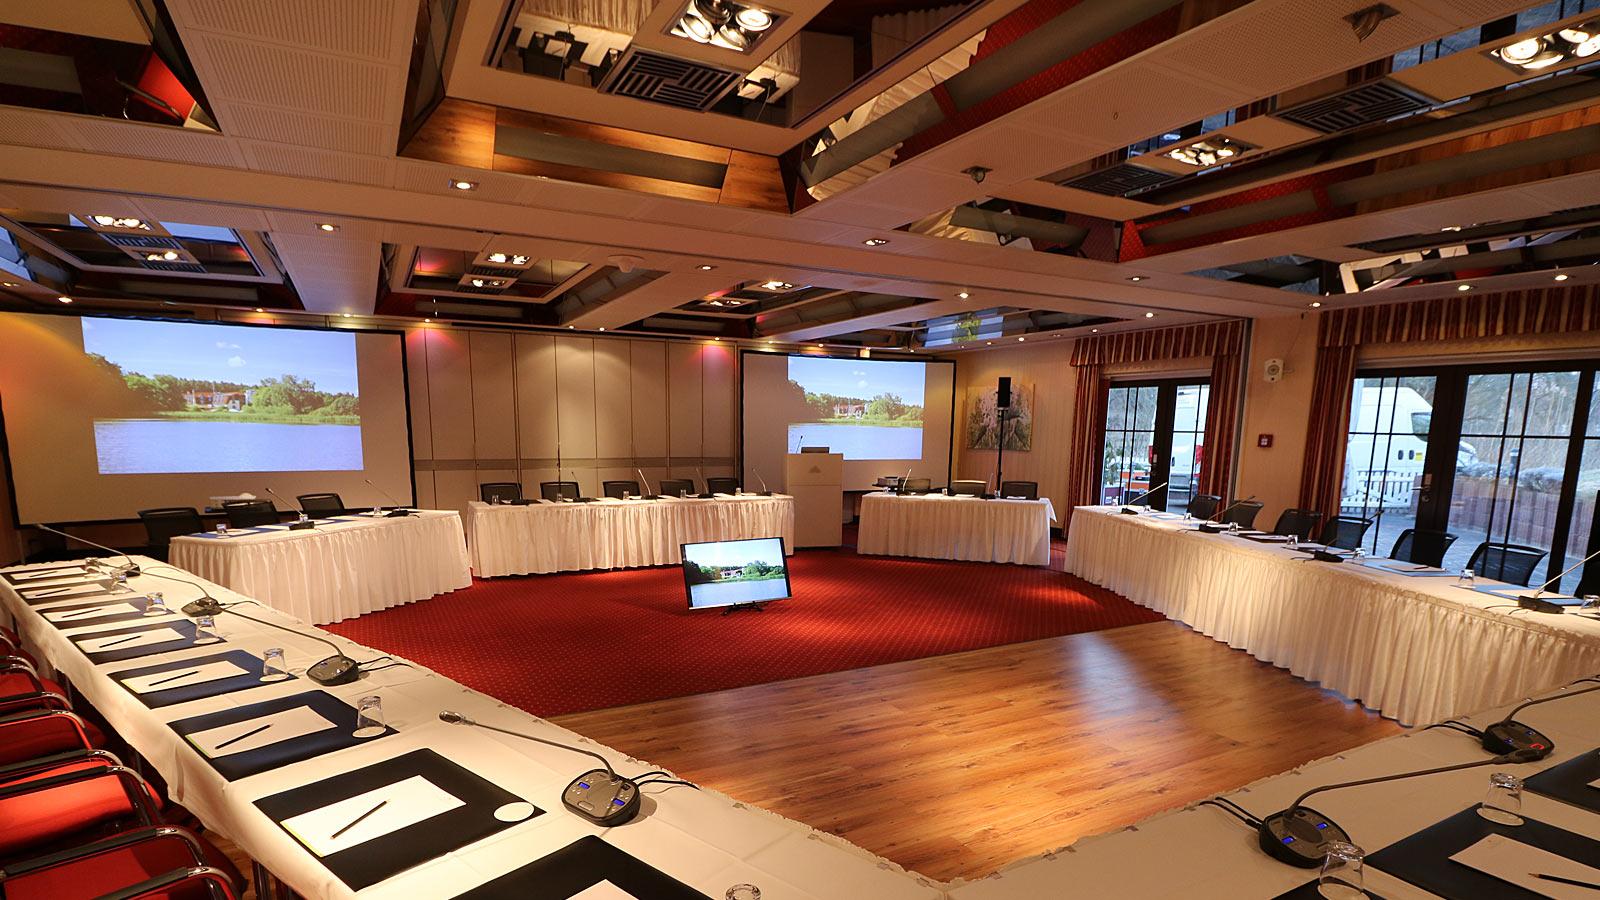 Tagungsräume im Hotel am See - Hotel & Spa Sommerfeld